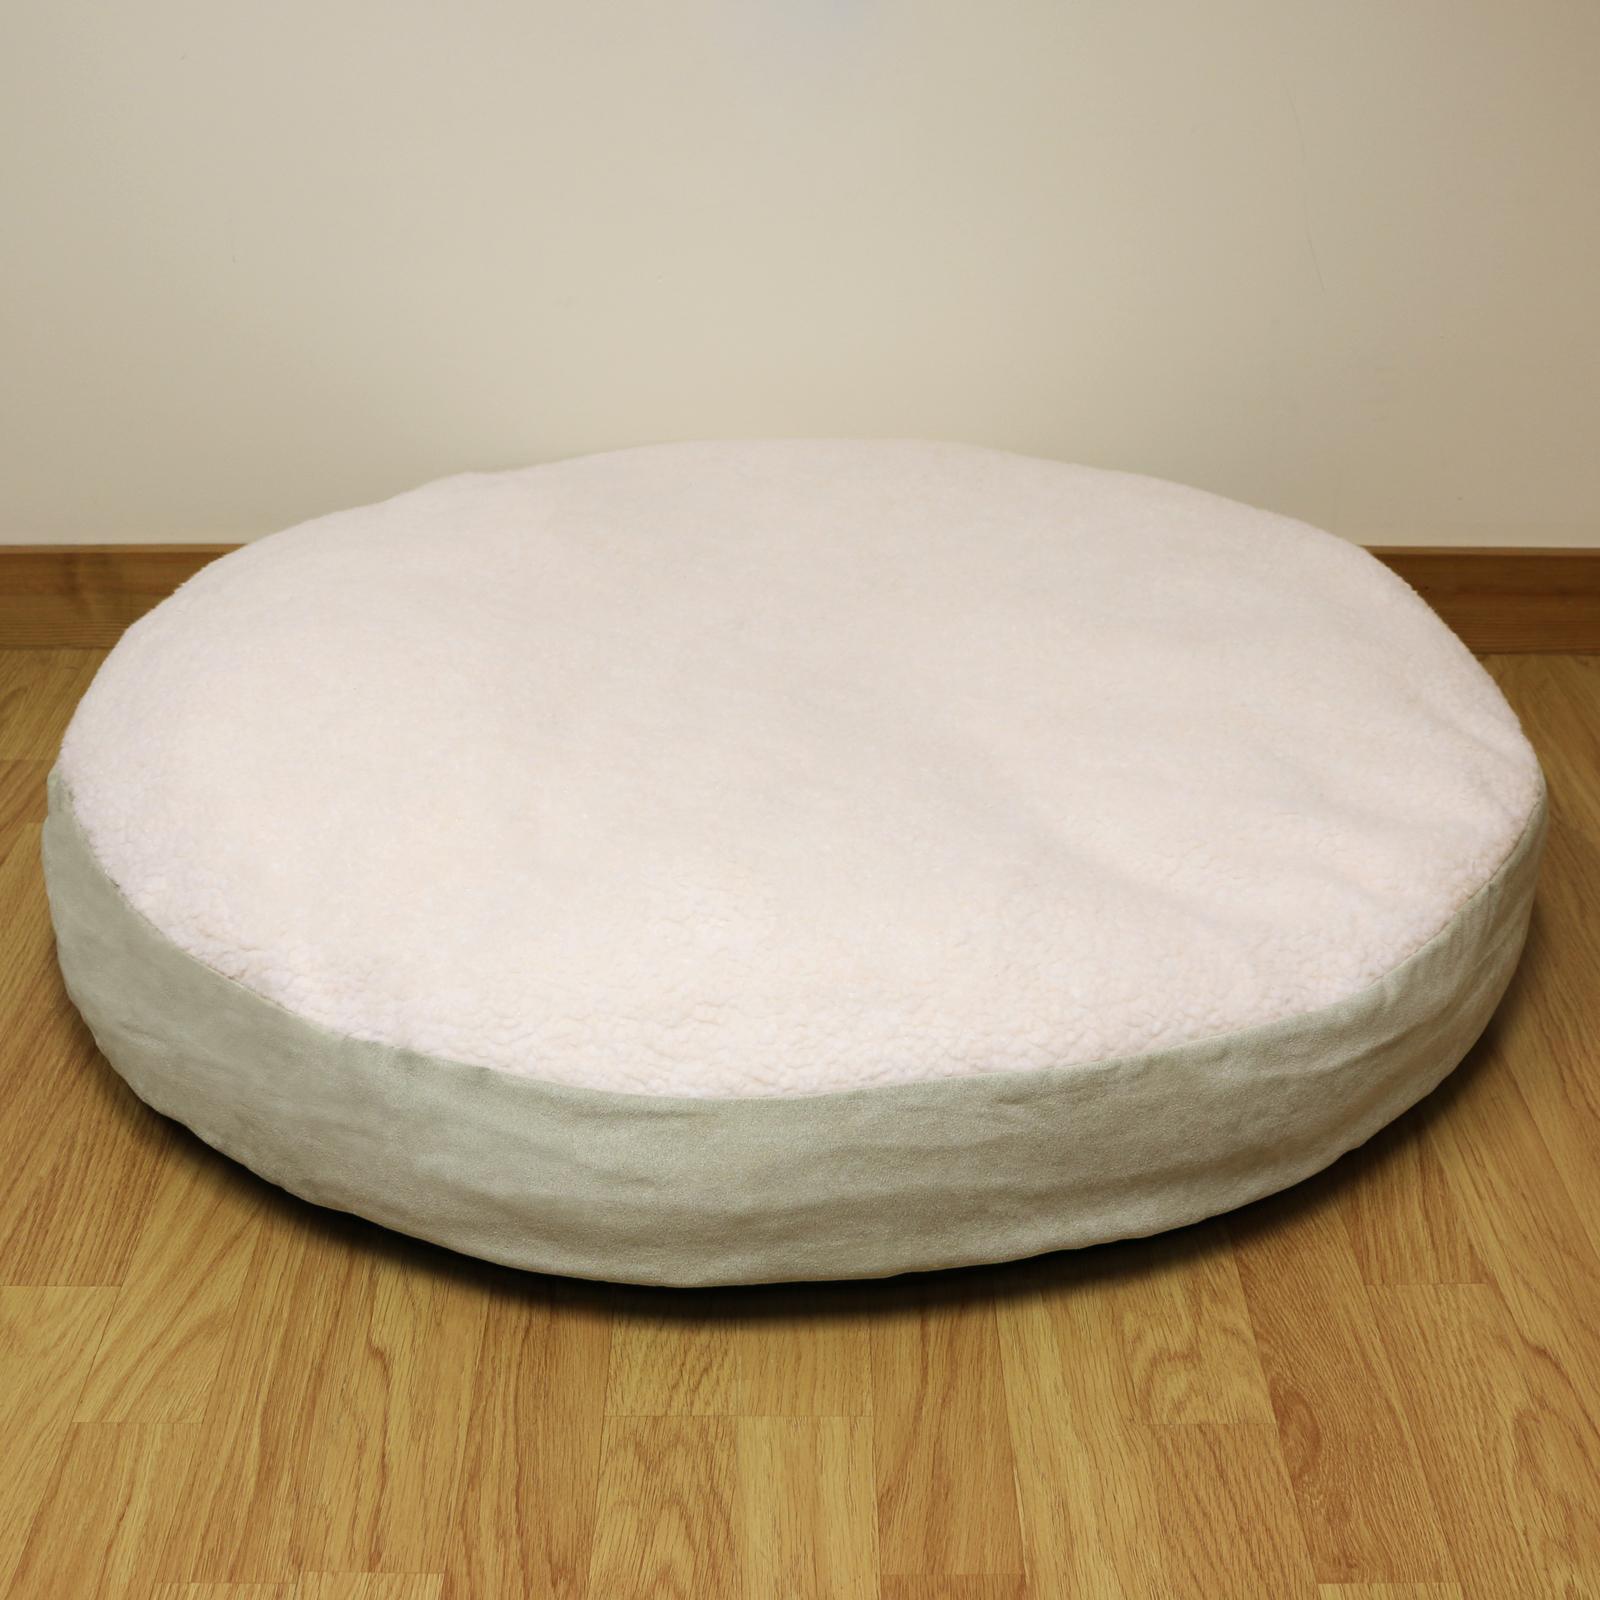 Sentinel Xl Extra Large Circular Fleece Pet Dog Bed Round Cushion Pillow Soft